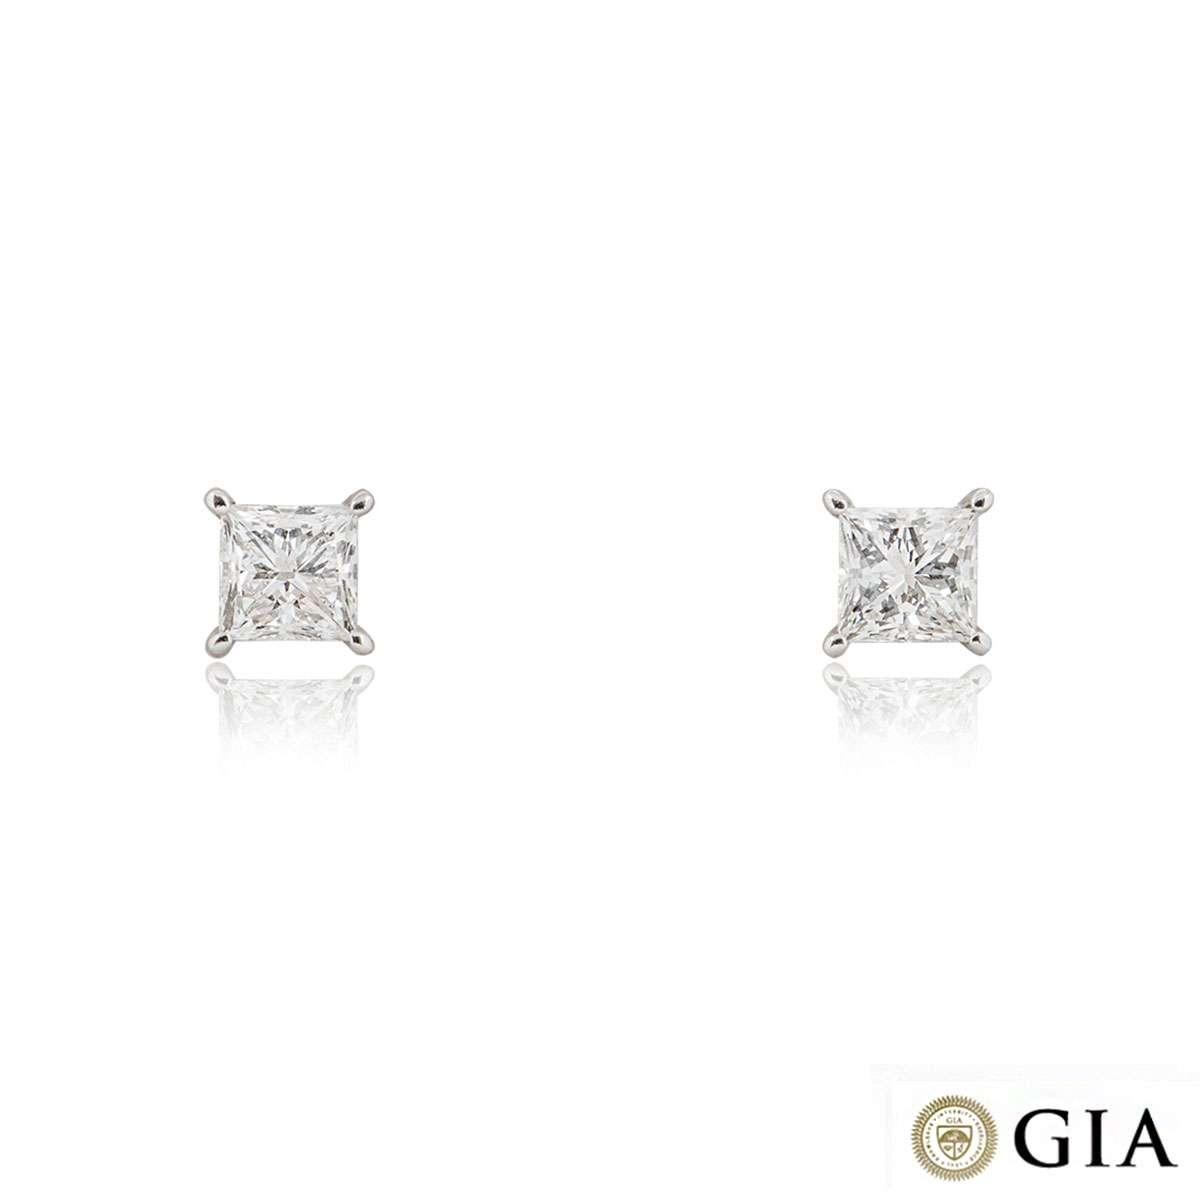 White Gold Princess Cut Diamond Earrings 3.42ct TDW I/VS2